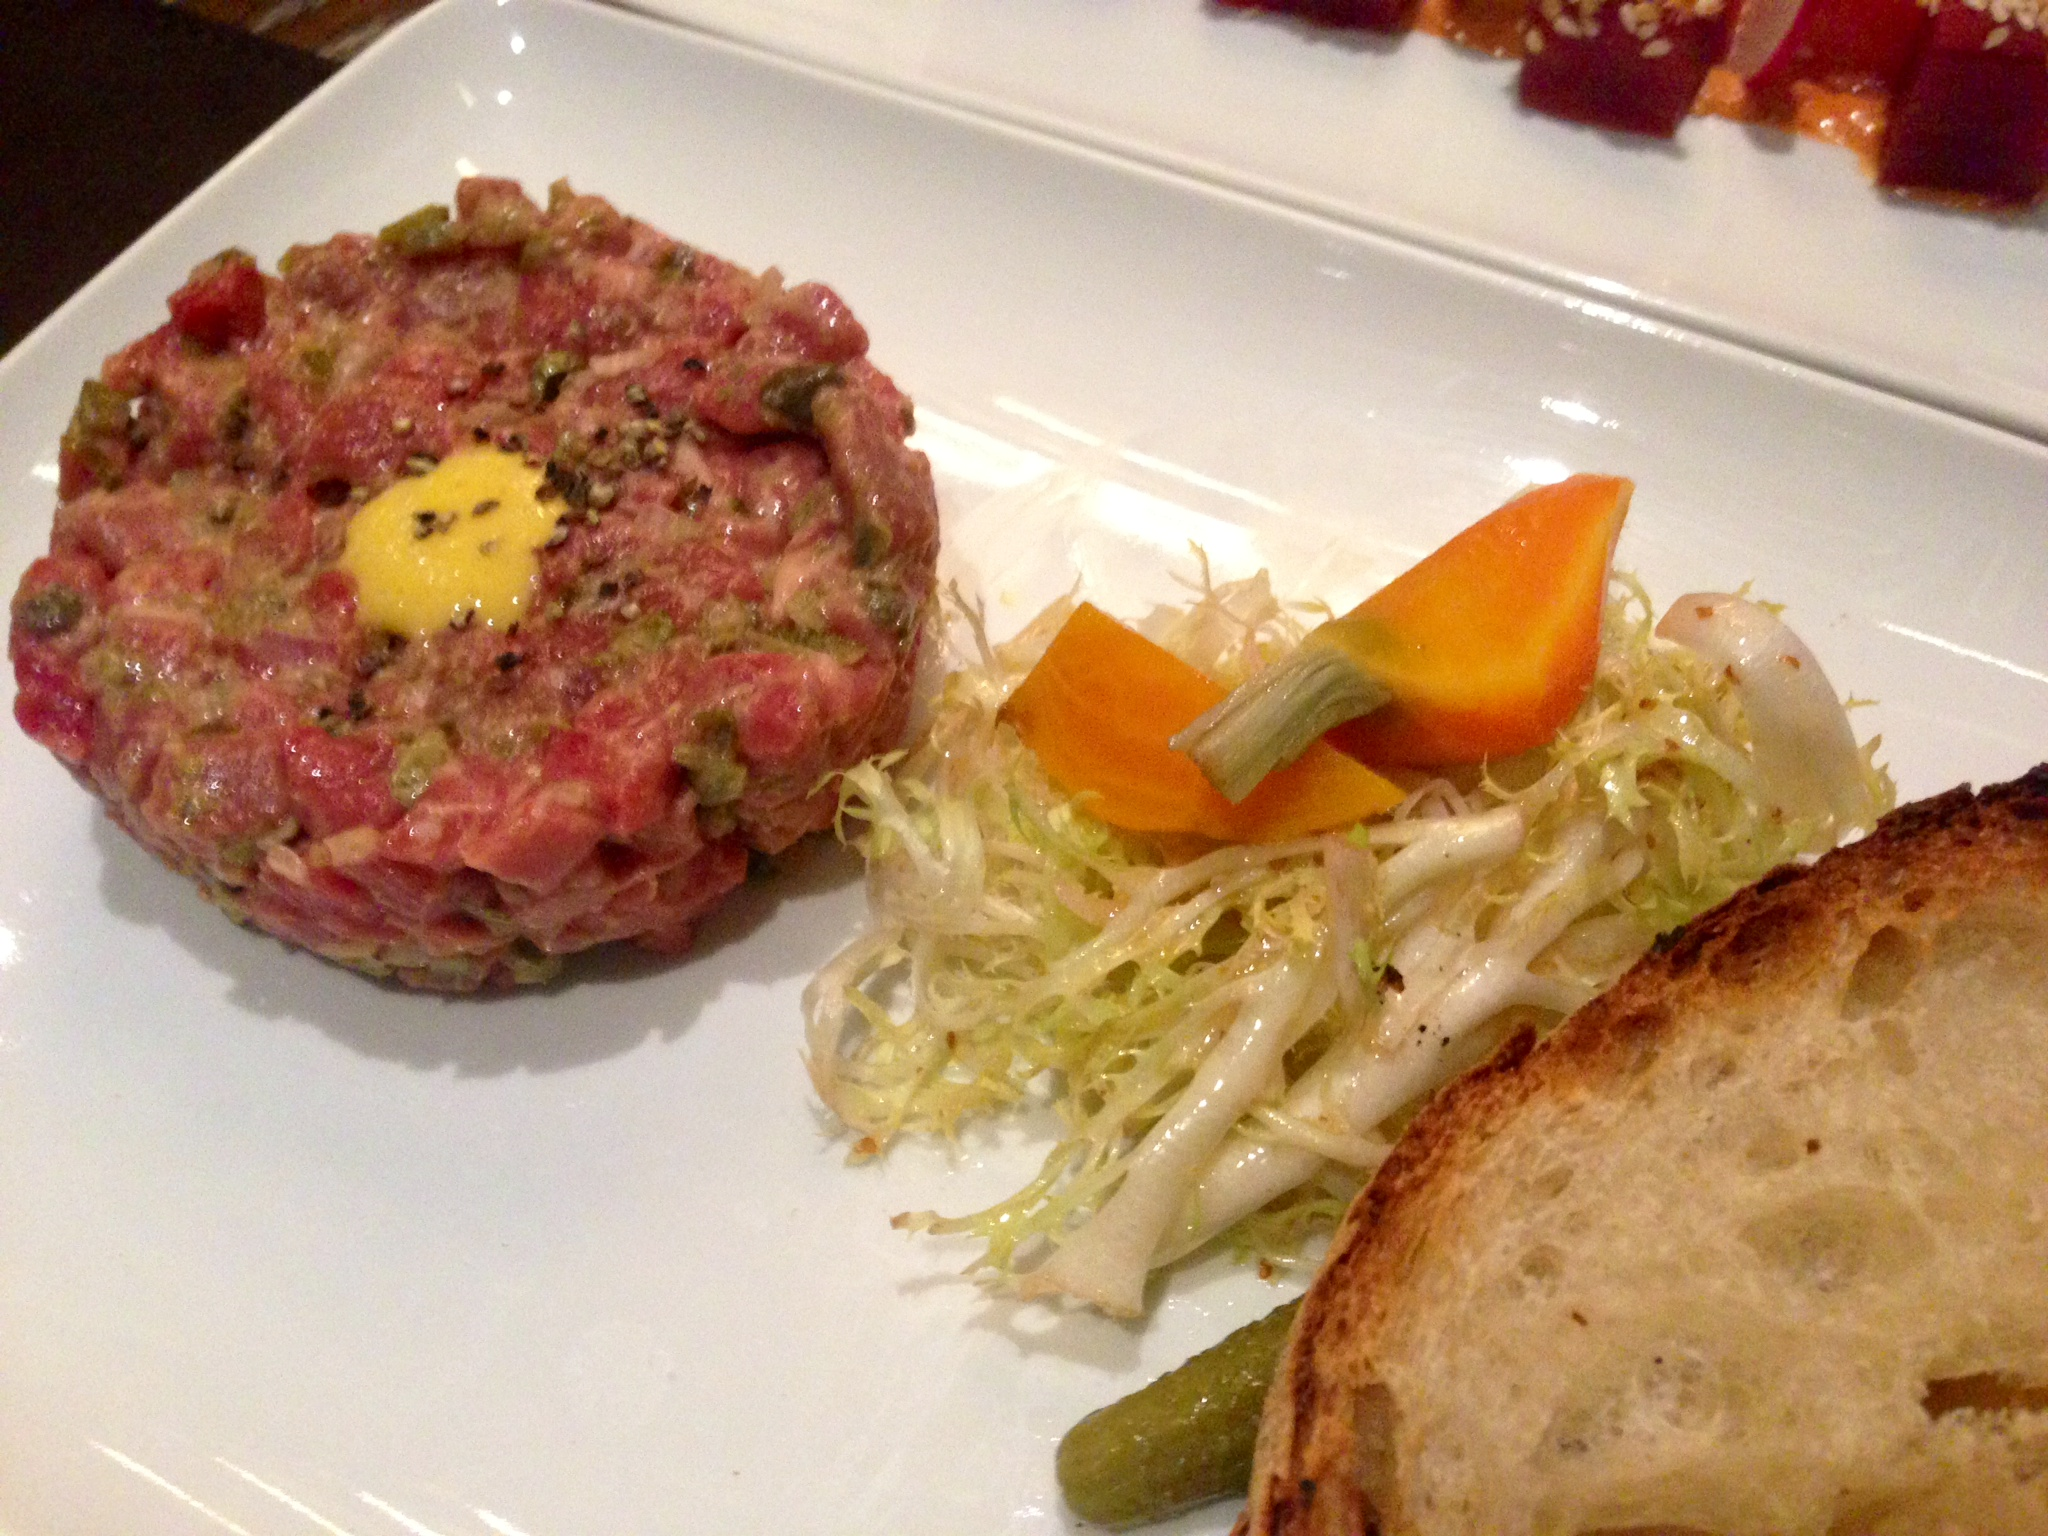 Hand- Cut Steak Tartare